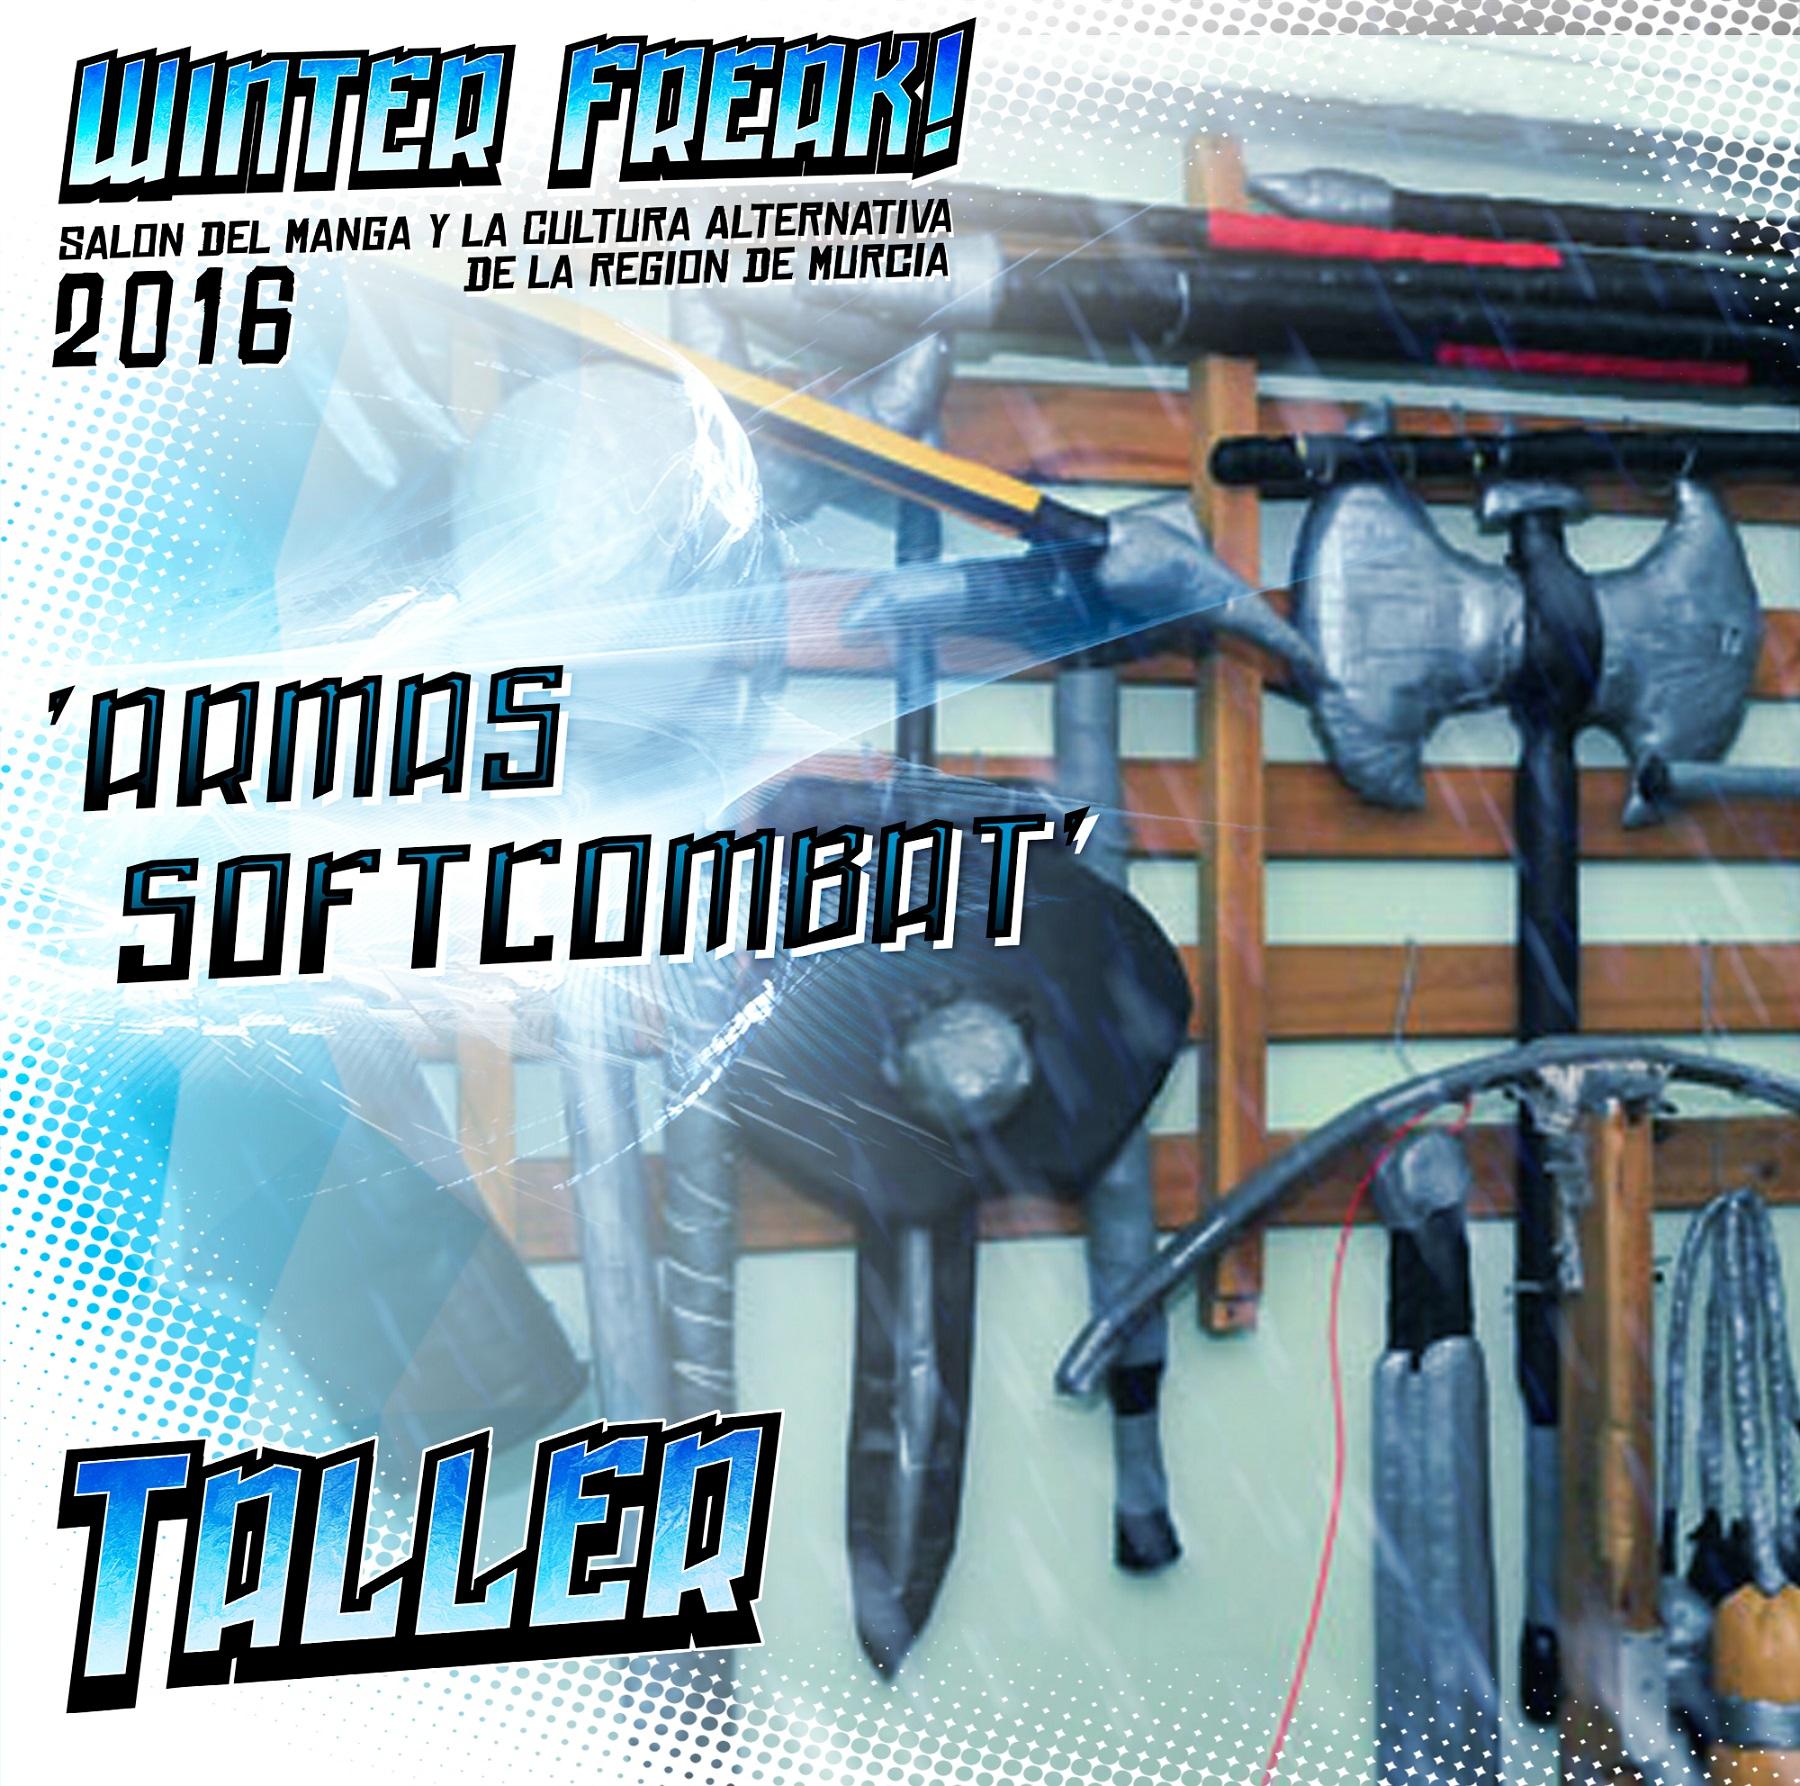 Taller de Armas Softcombat